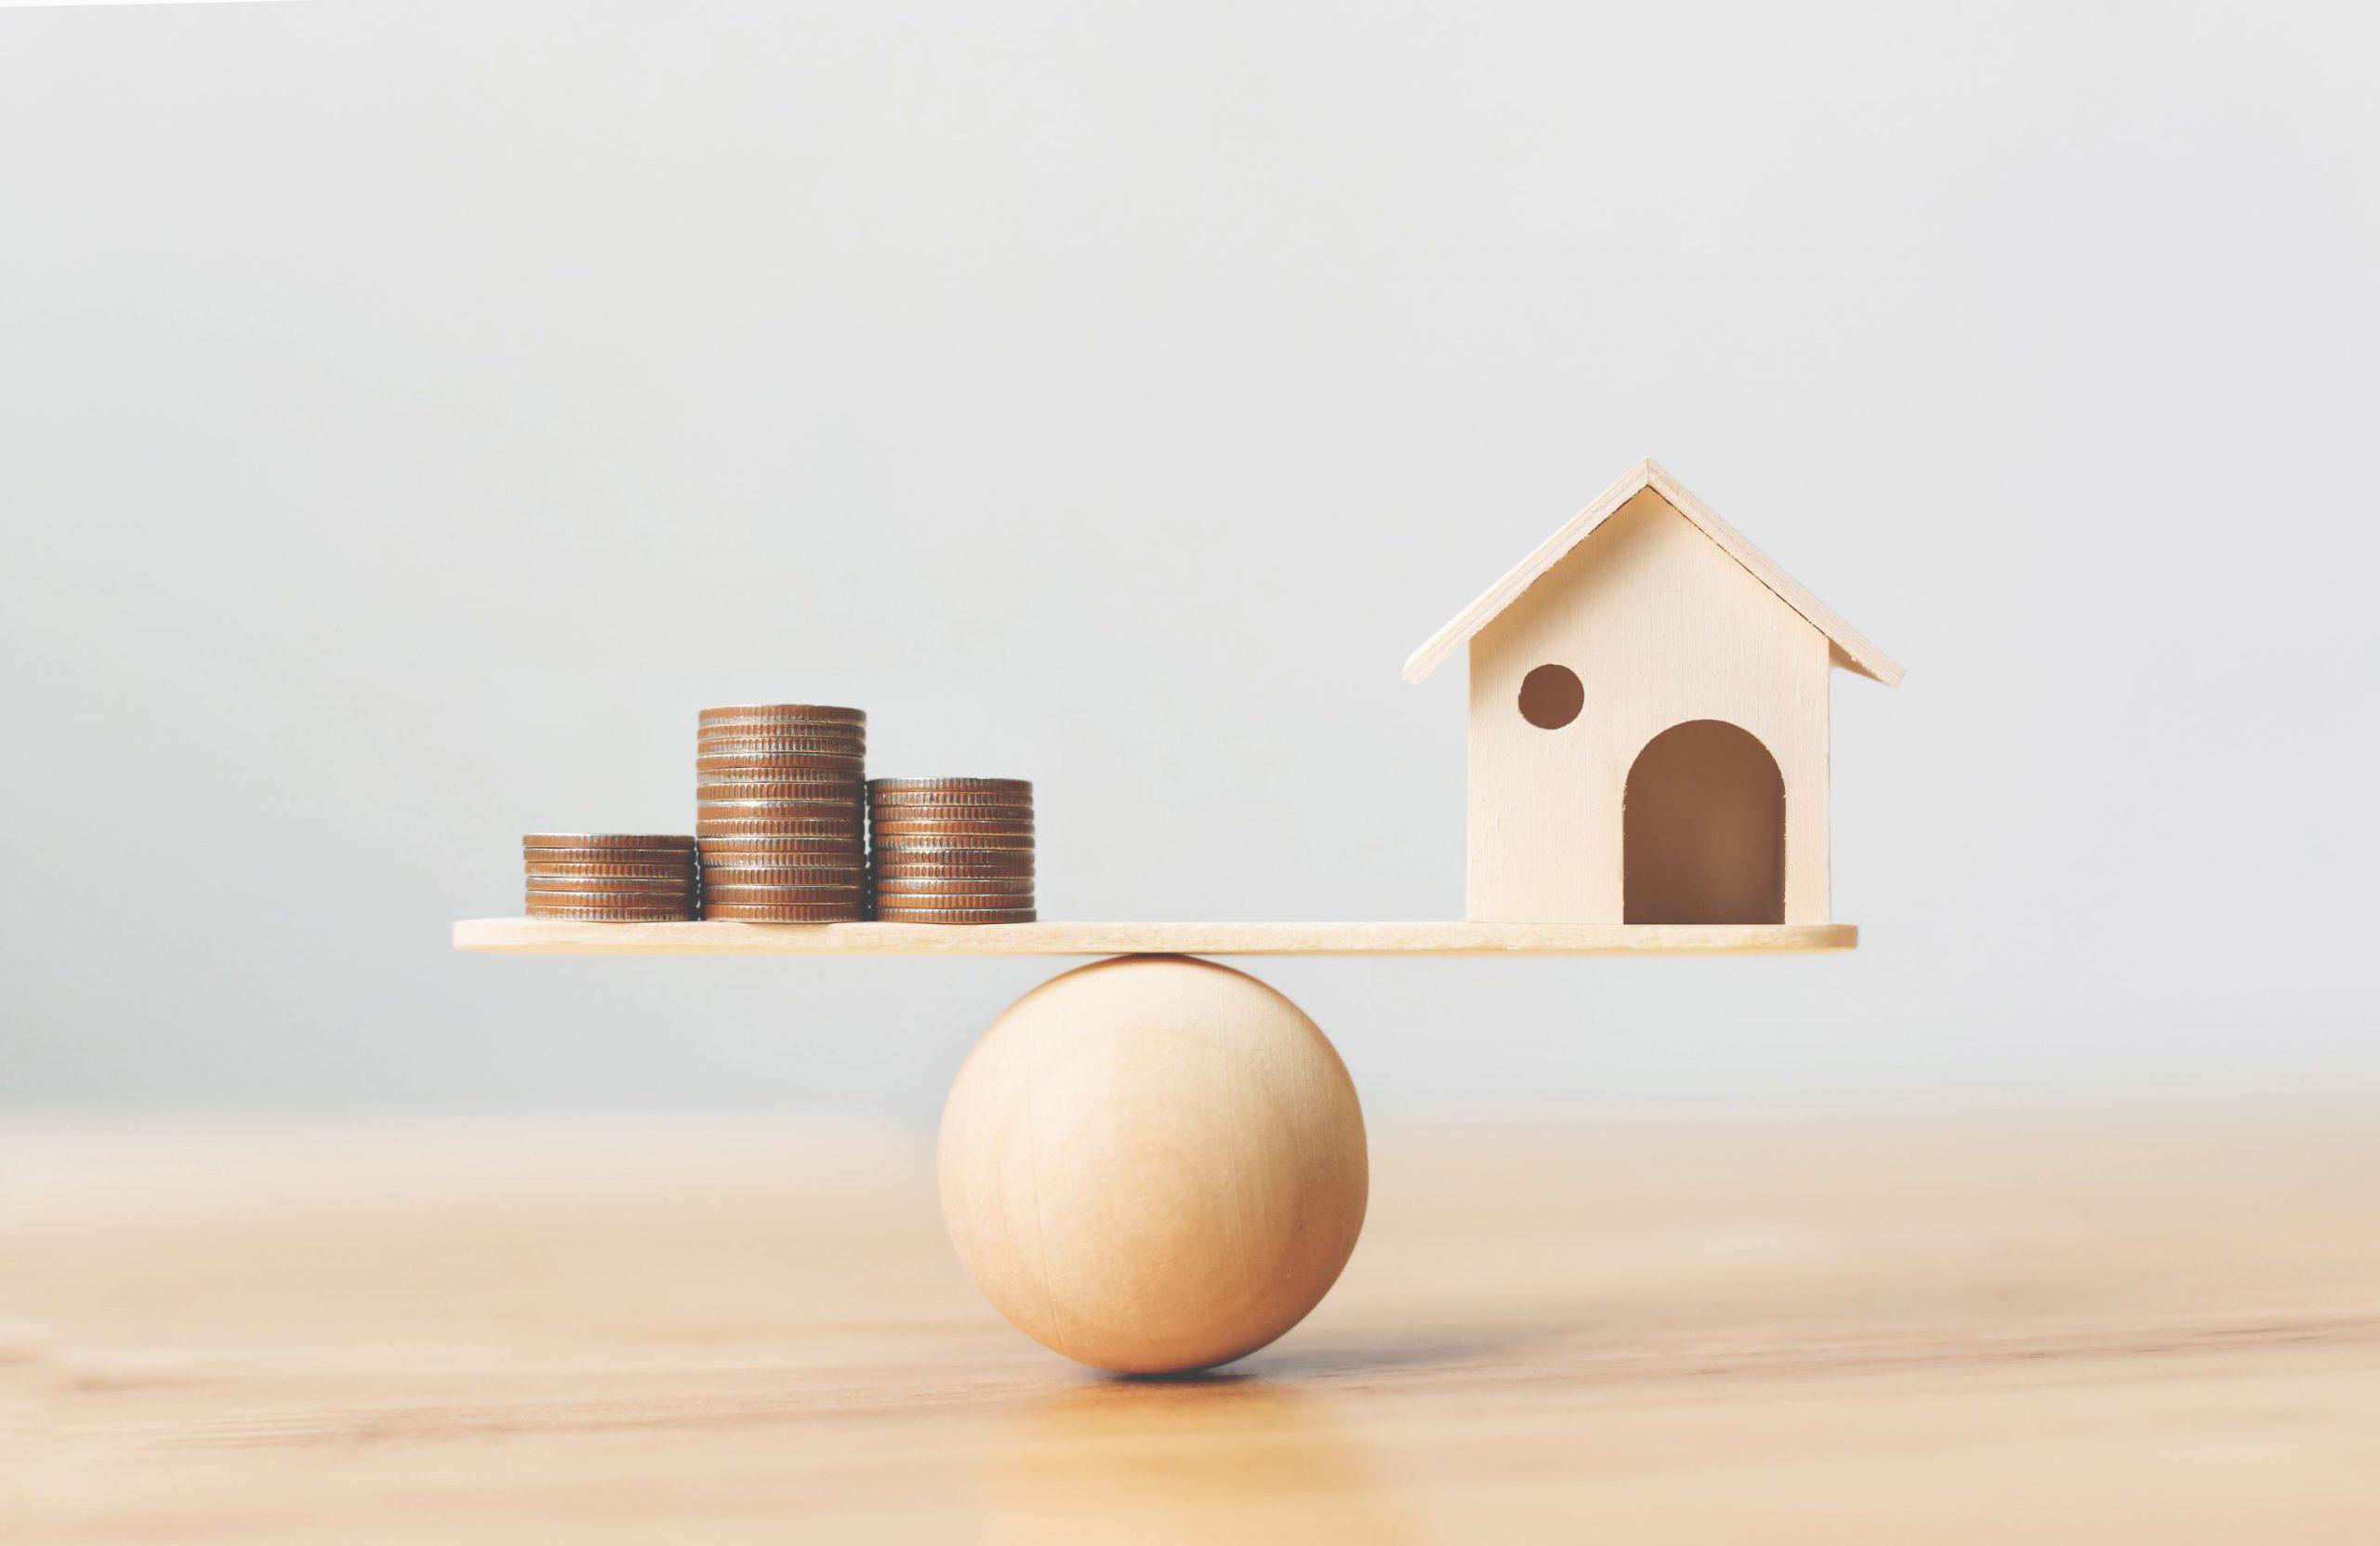 prix assurance habitation quebec